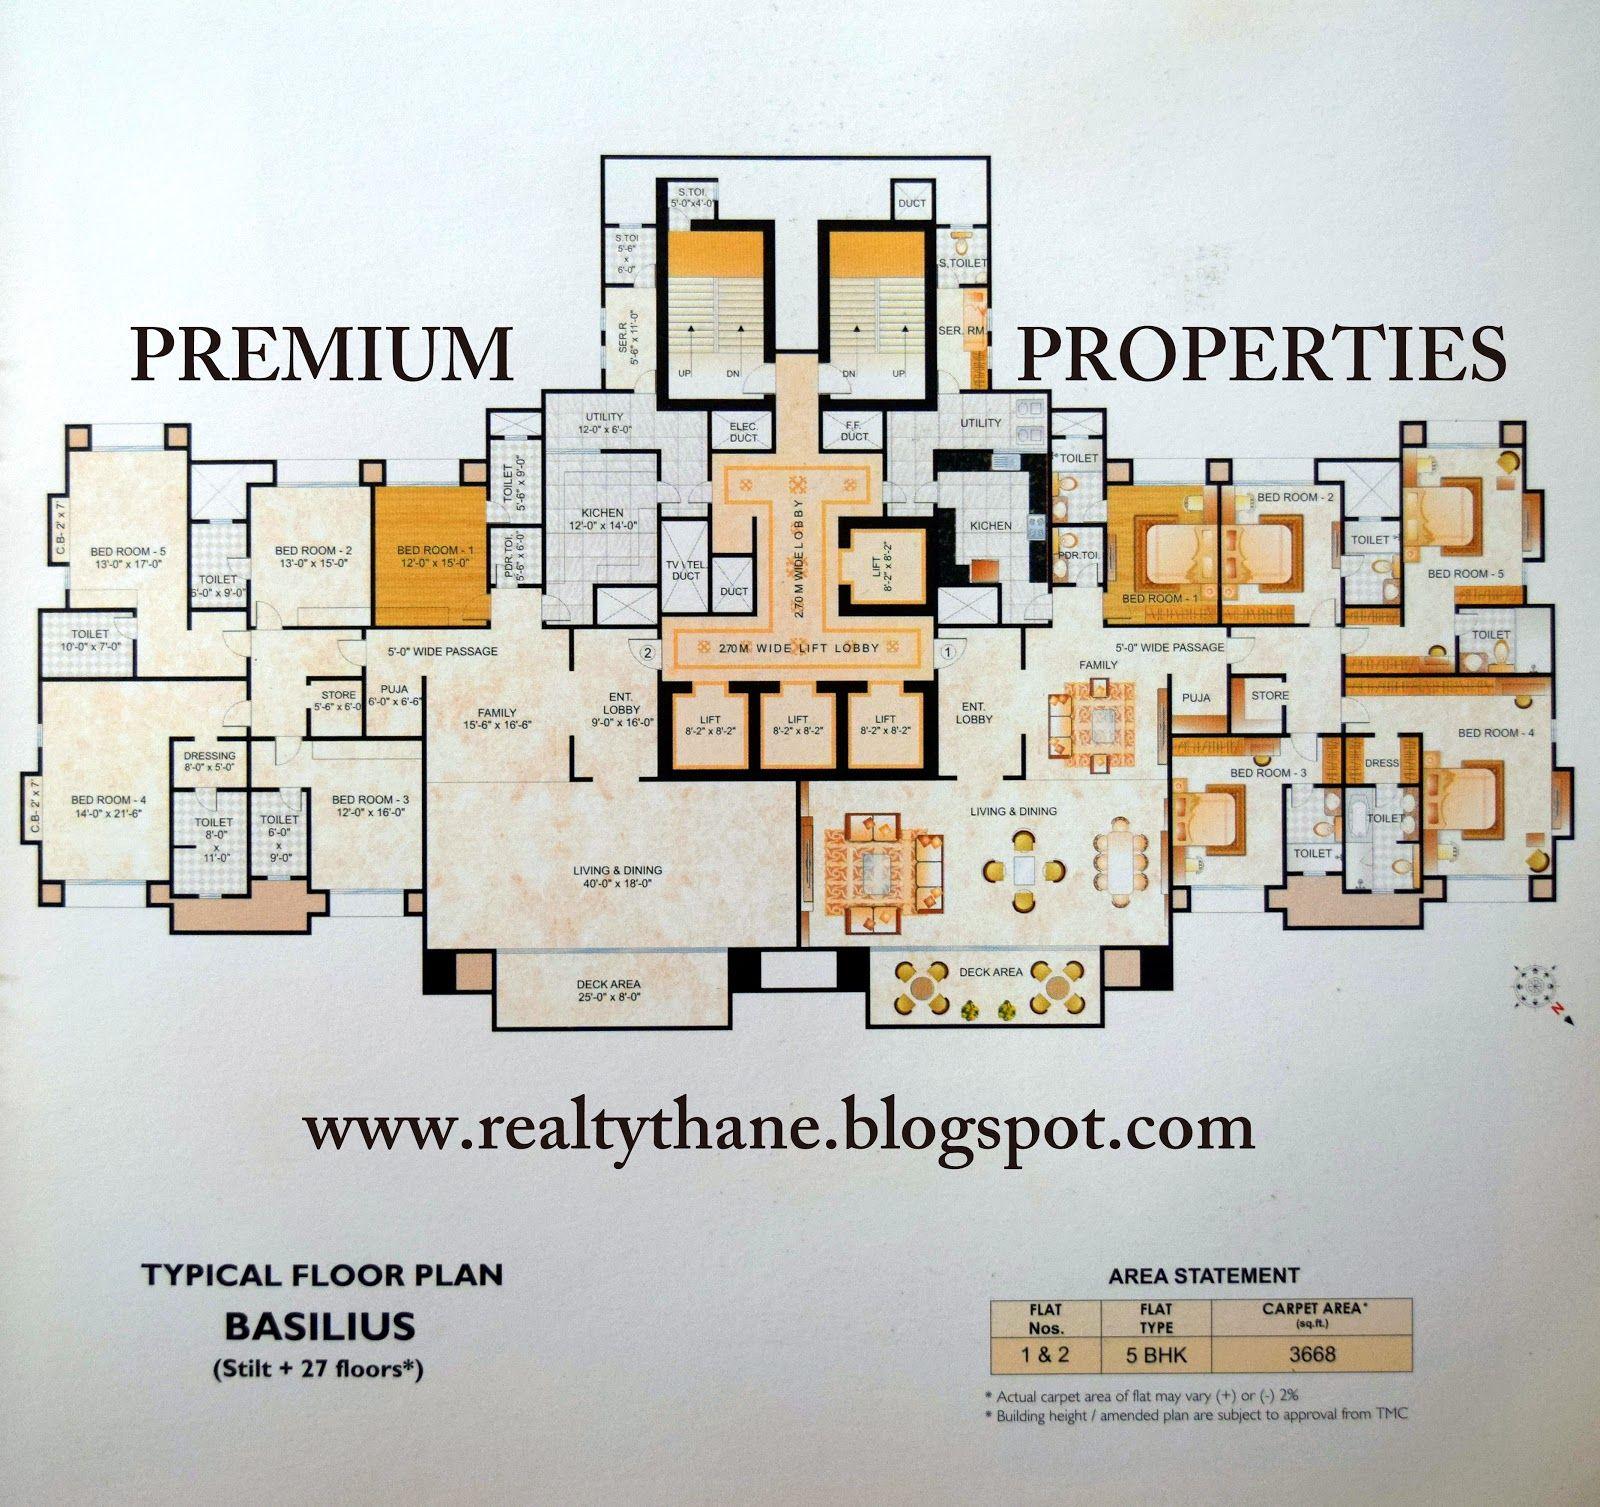 Evergreen Ridge Luxury Apartments On The River: Basilius Luxury Apartments Of 5 Bedrooms At Rodas